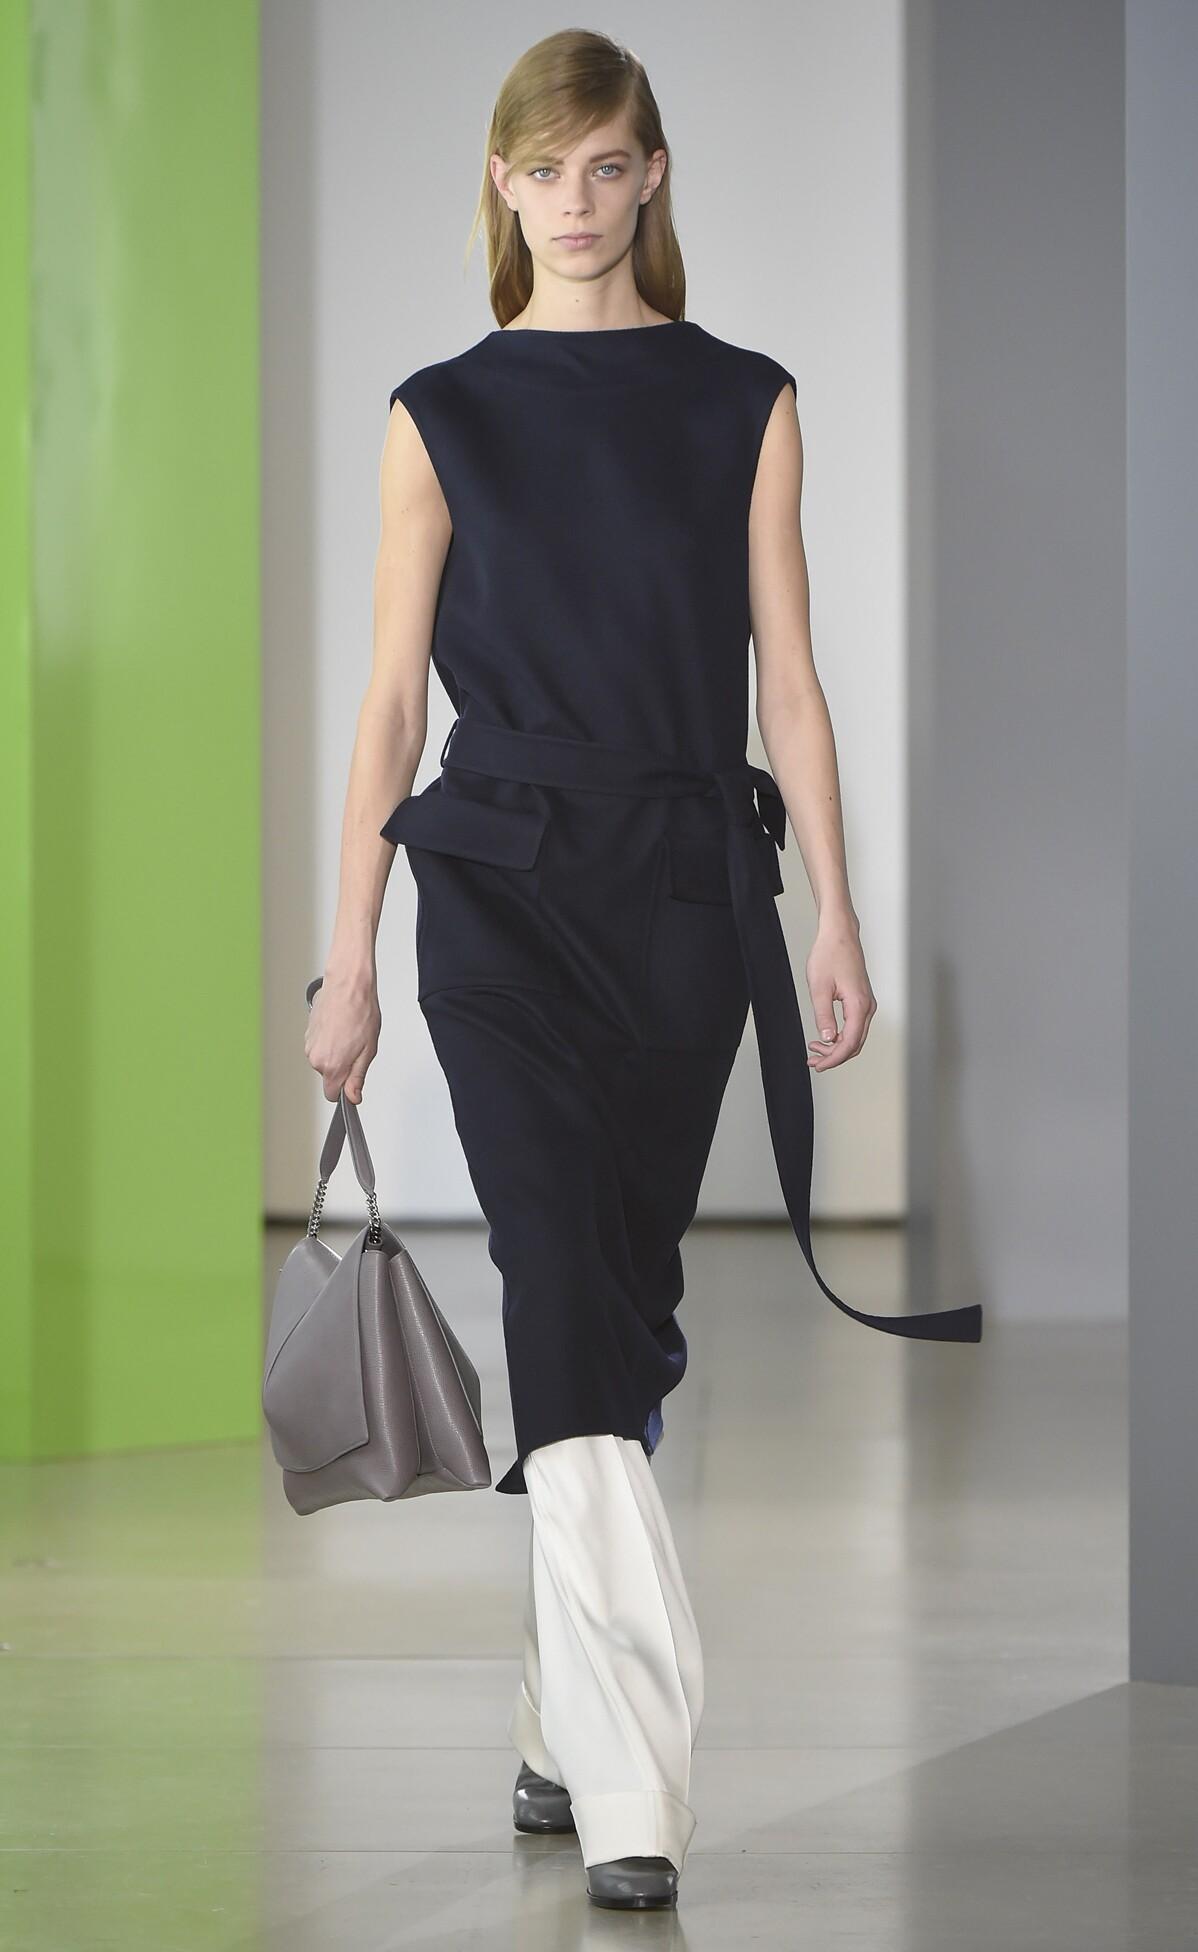 Catwalk Jil Sander Collection Fashion Show Winter 2015